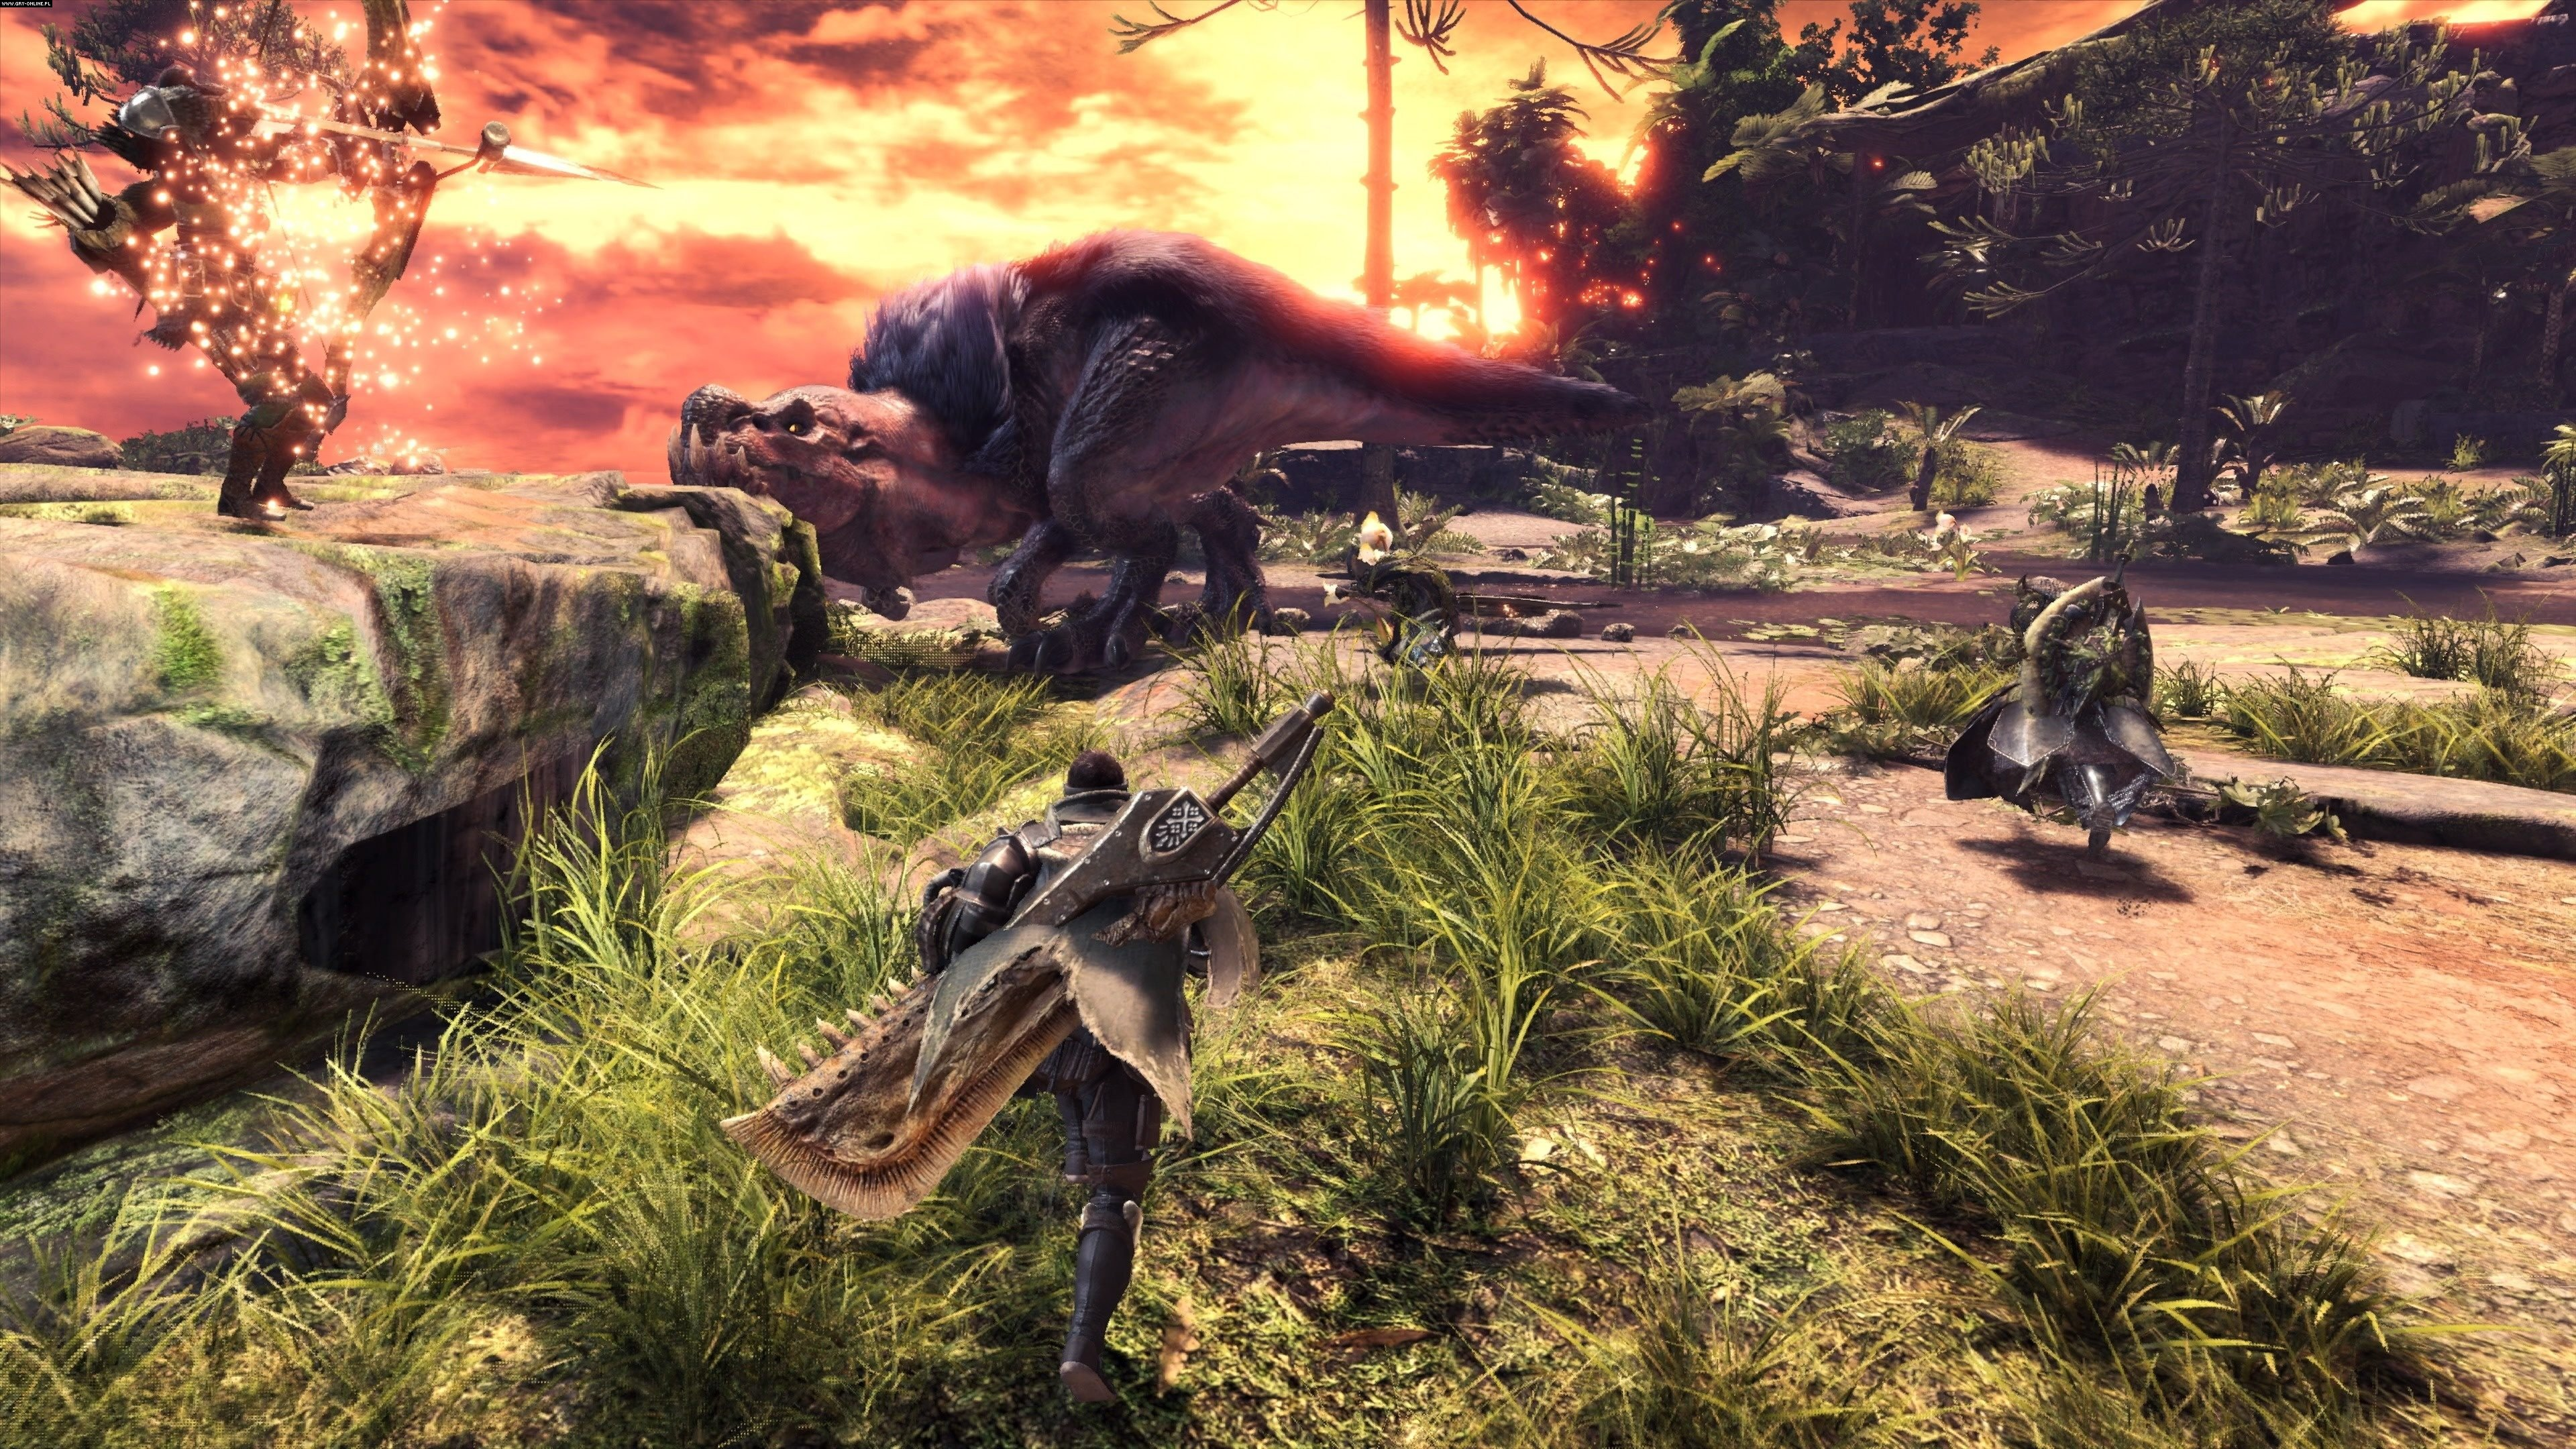 Monster Hunter: World PC, PS4, XONE Games Image 31/48, Capcom